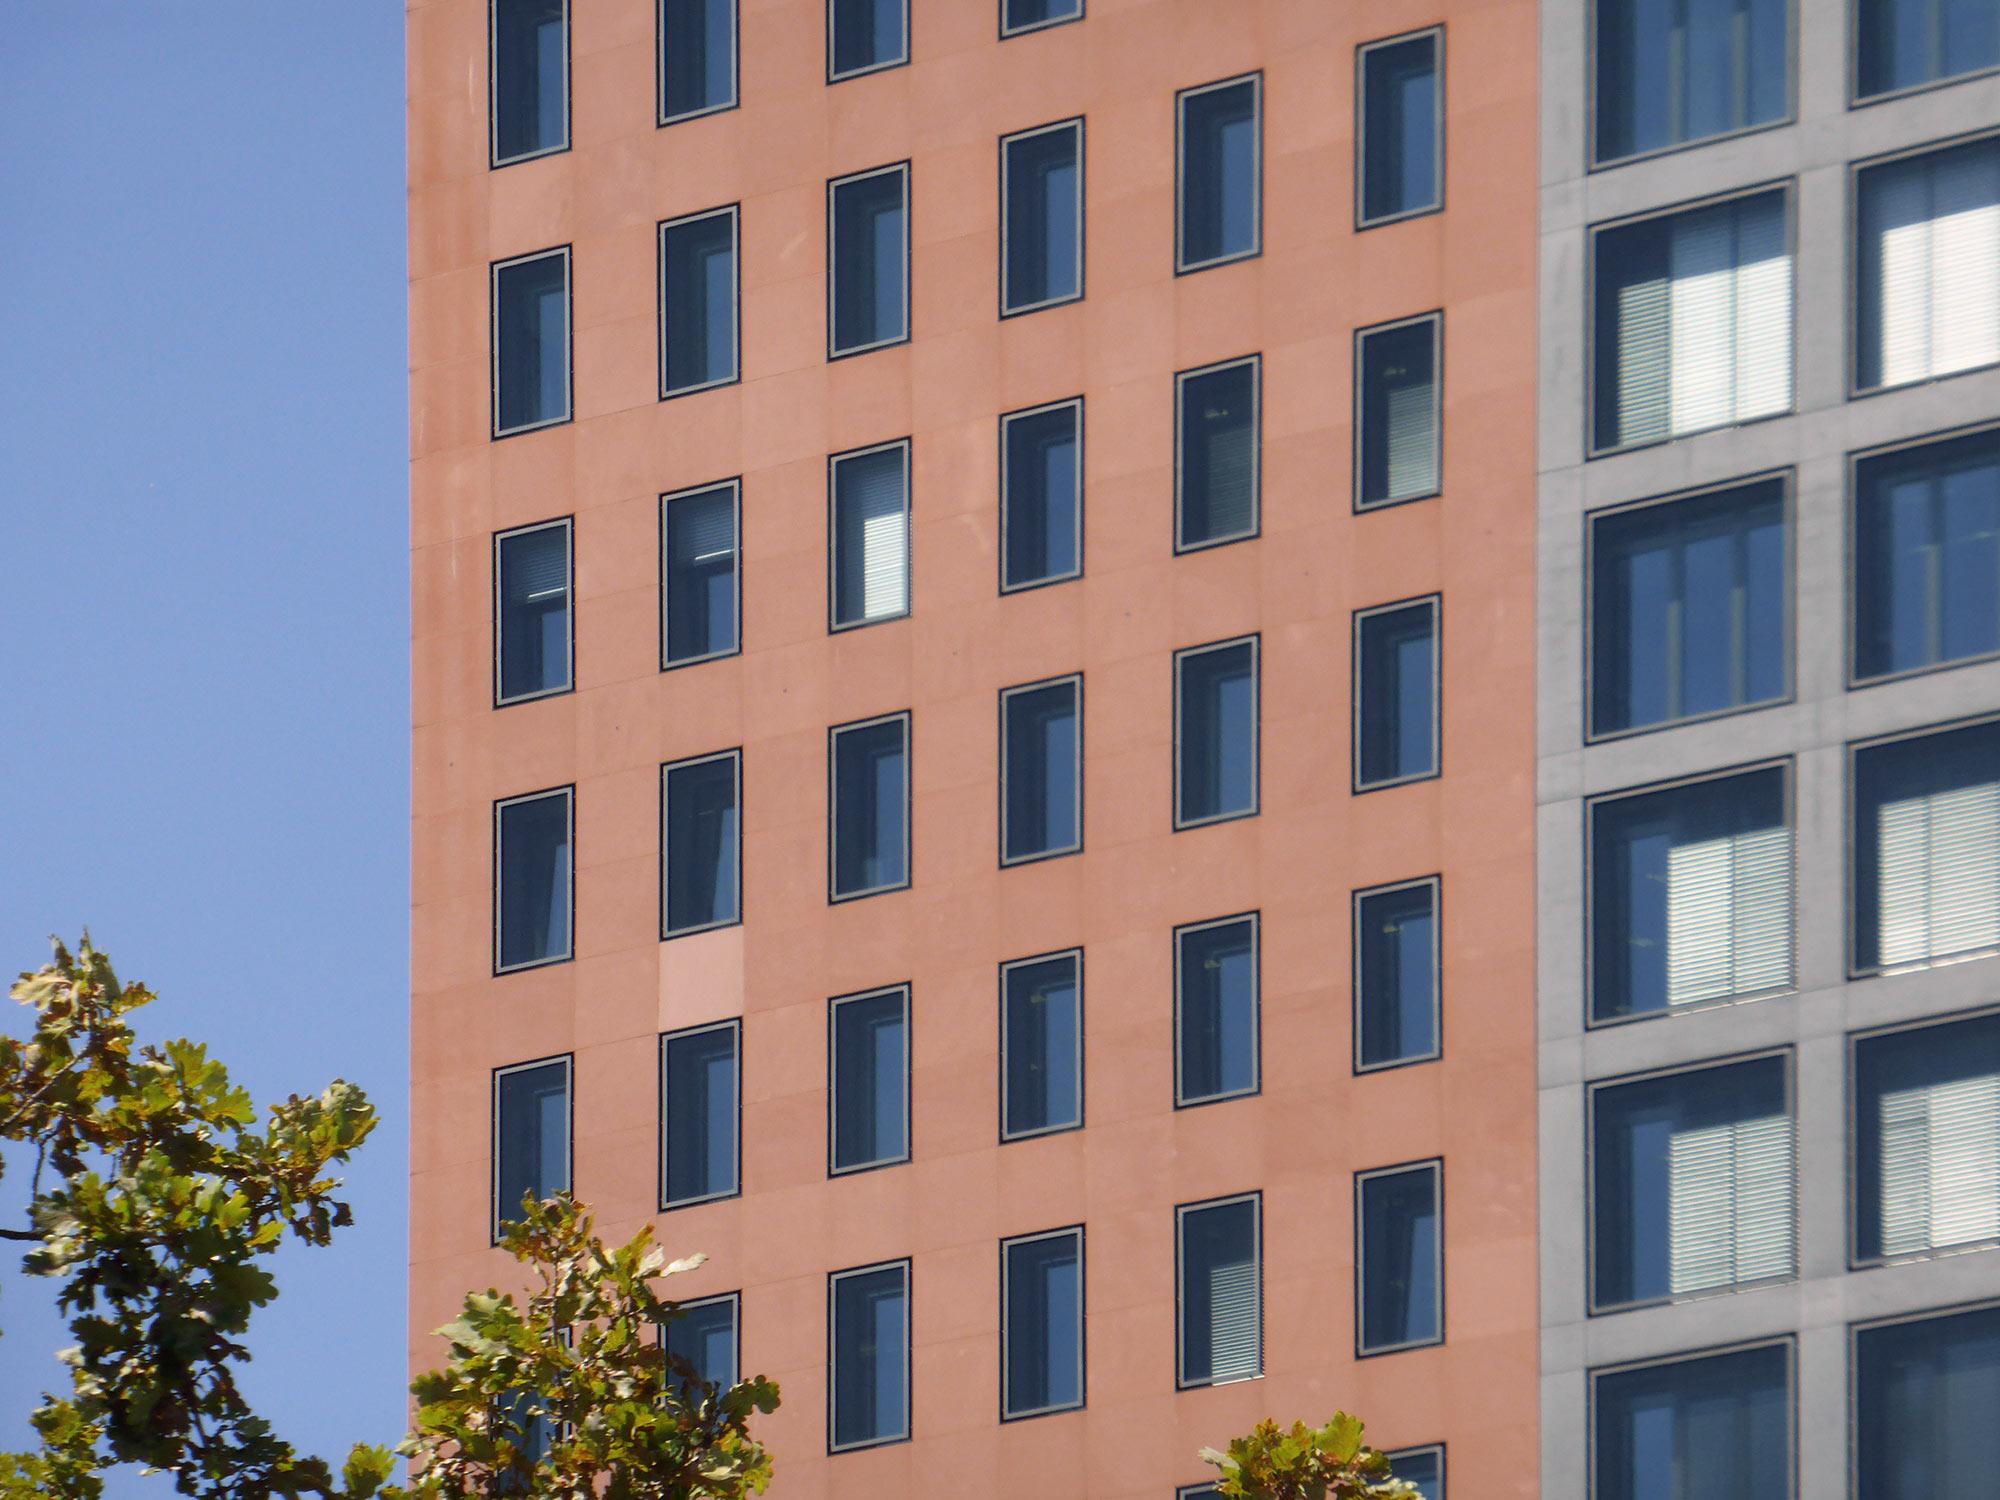 Frankfurt Main Forum Fassade - Moderne Architektur Frankfurt - IG Metall Hochhaus